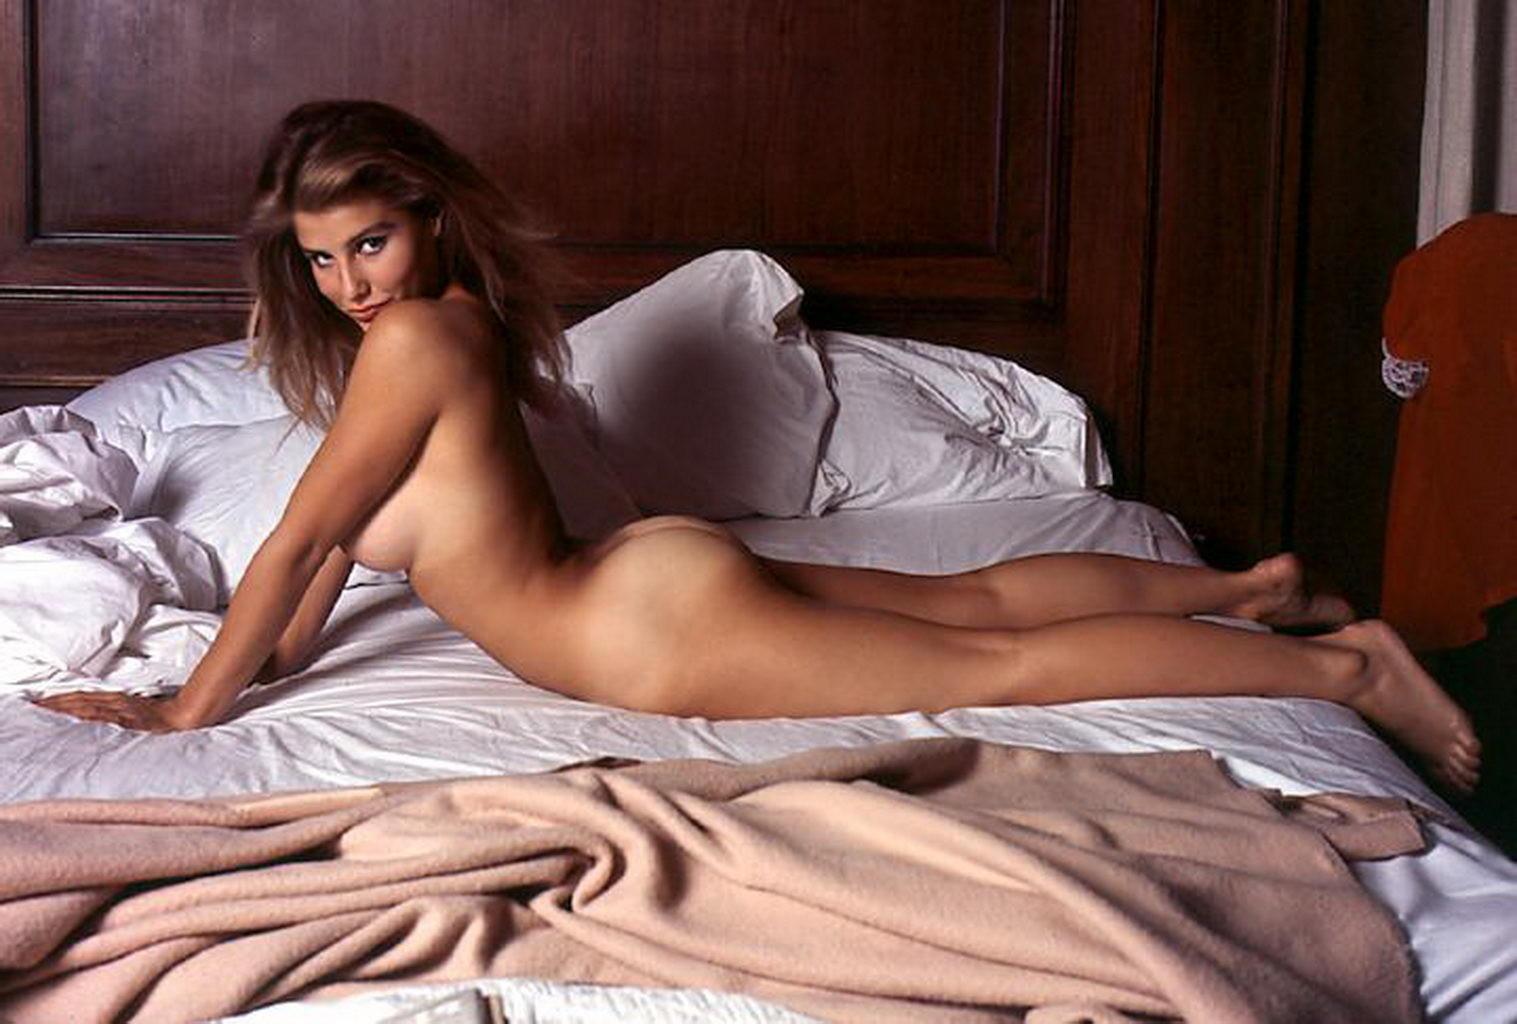 Michelle dell nude, best free busty blonde sex videox